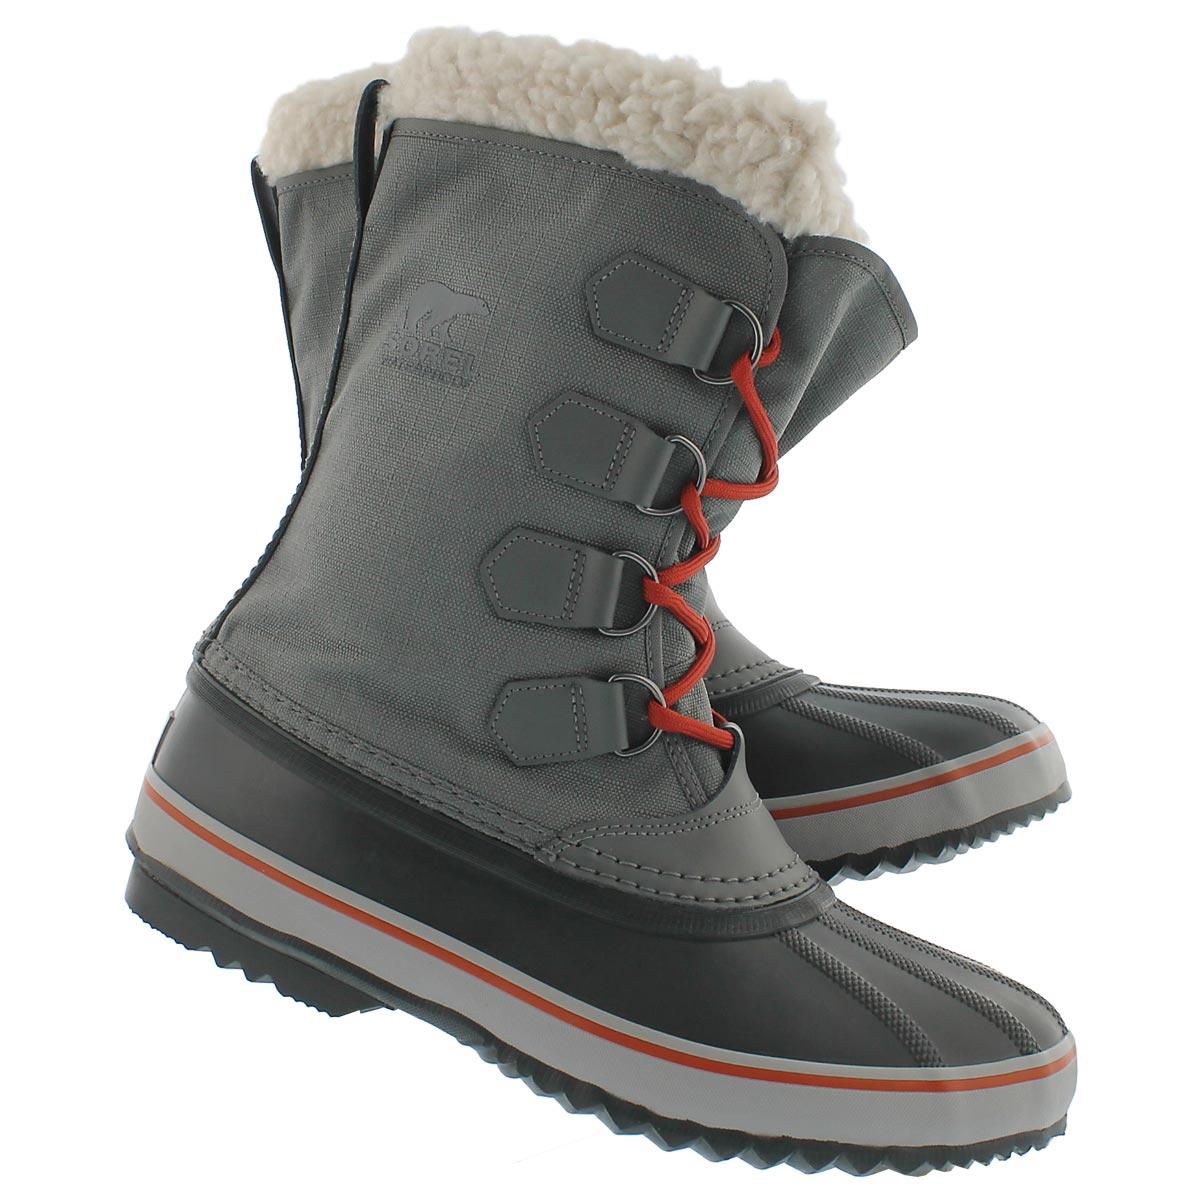 Mns 1964 Pac Nylon dk fog winter boot